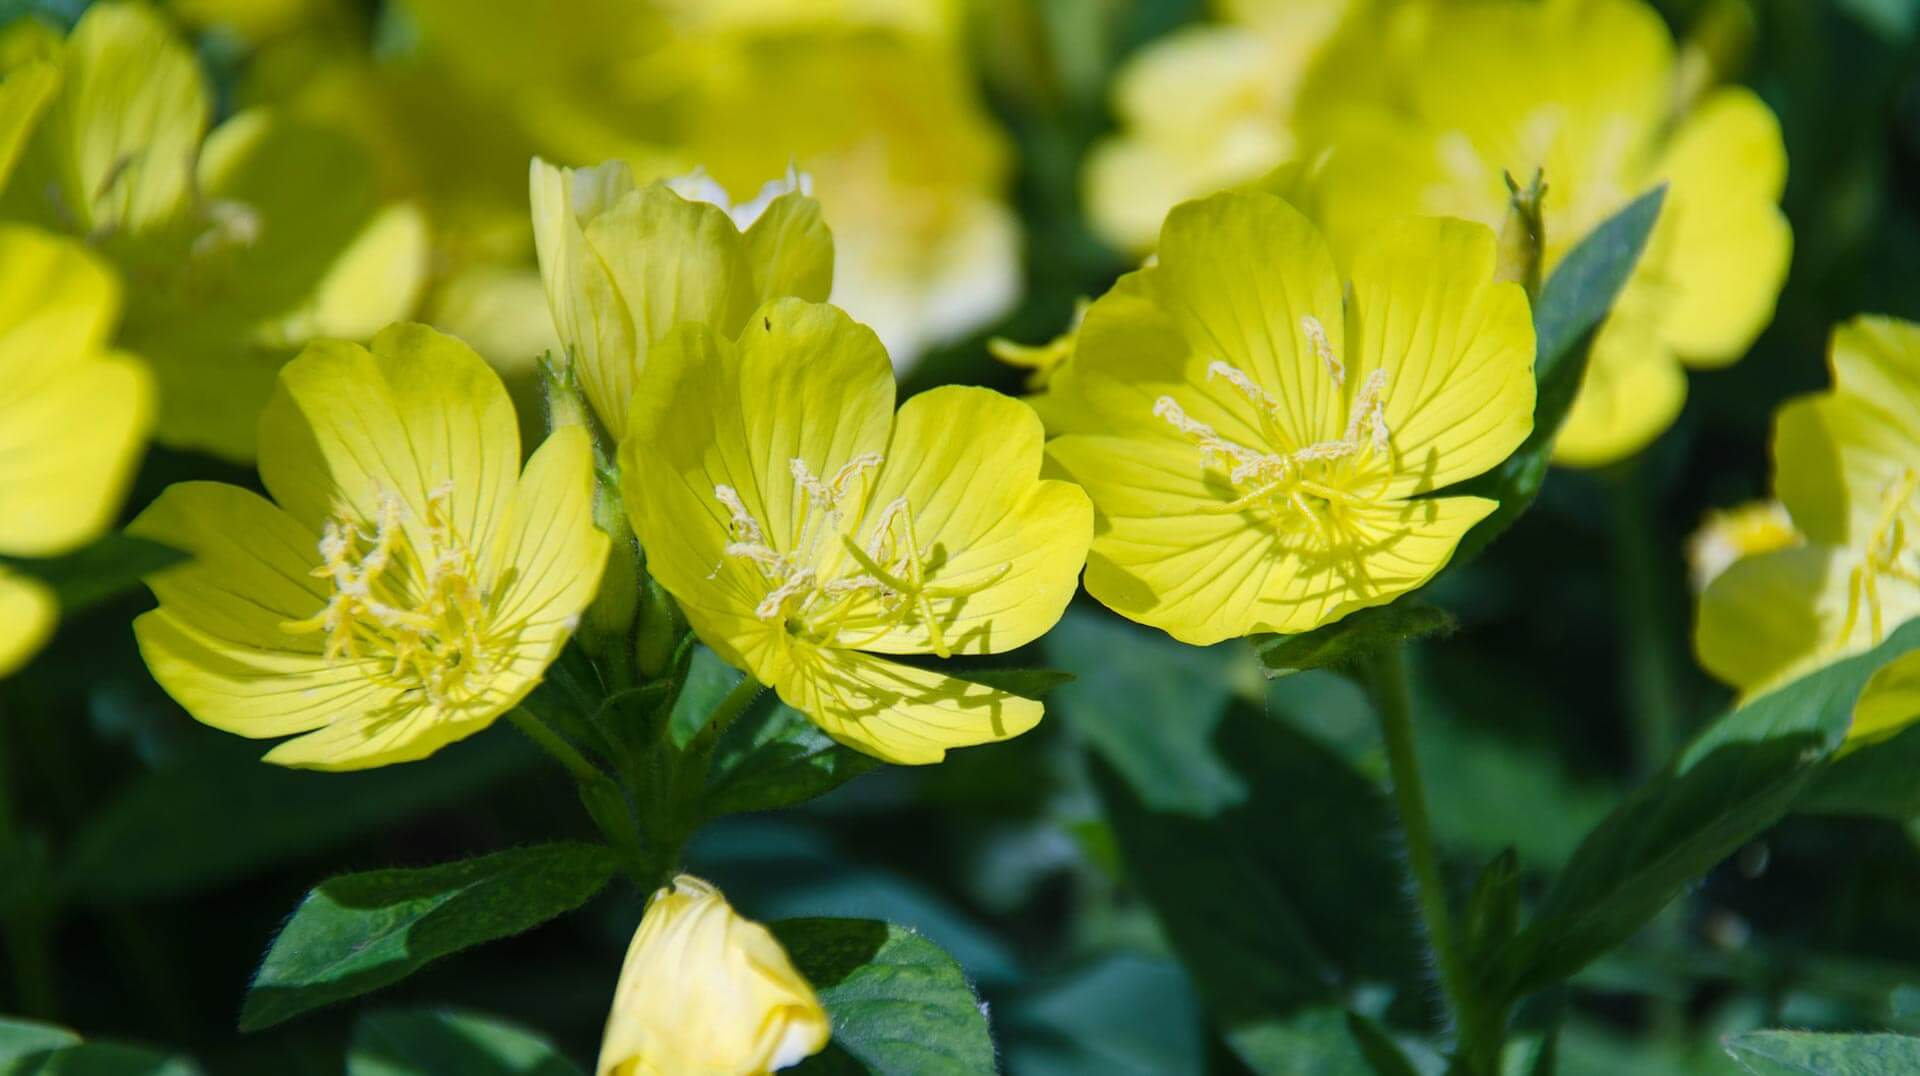 evening primrose oil flowers